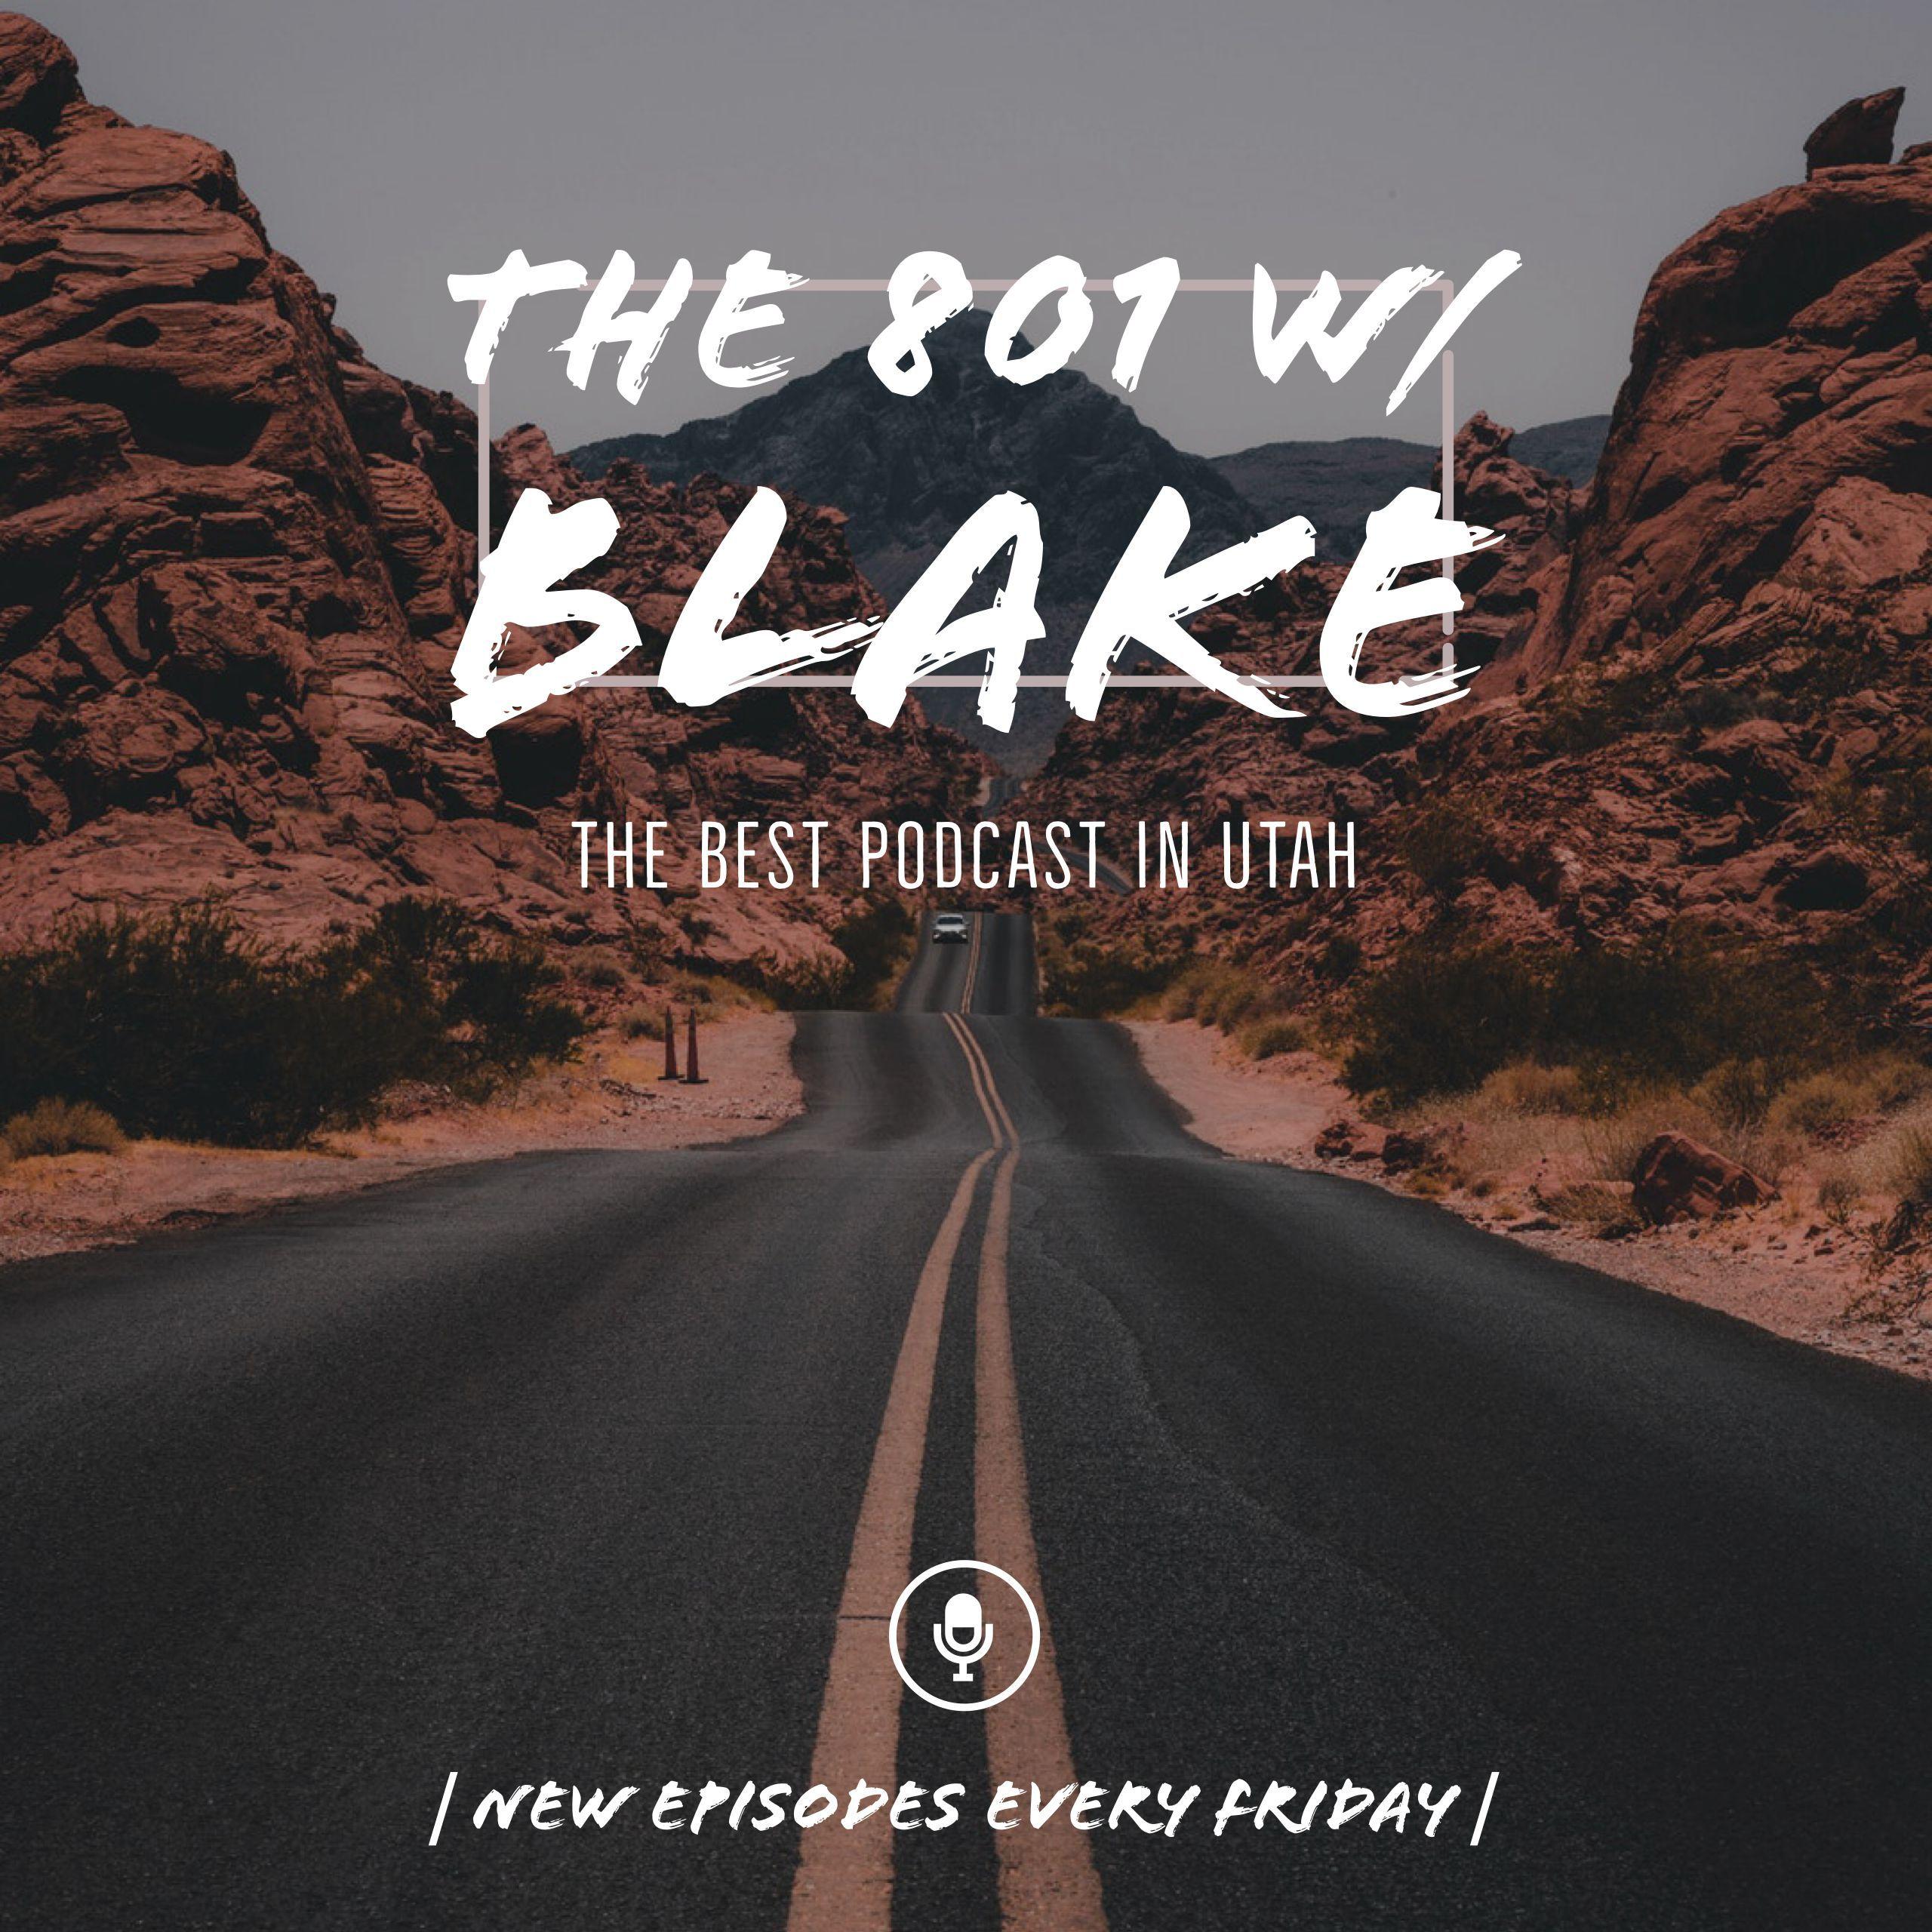 The 801 w/ Blake